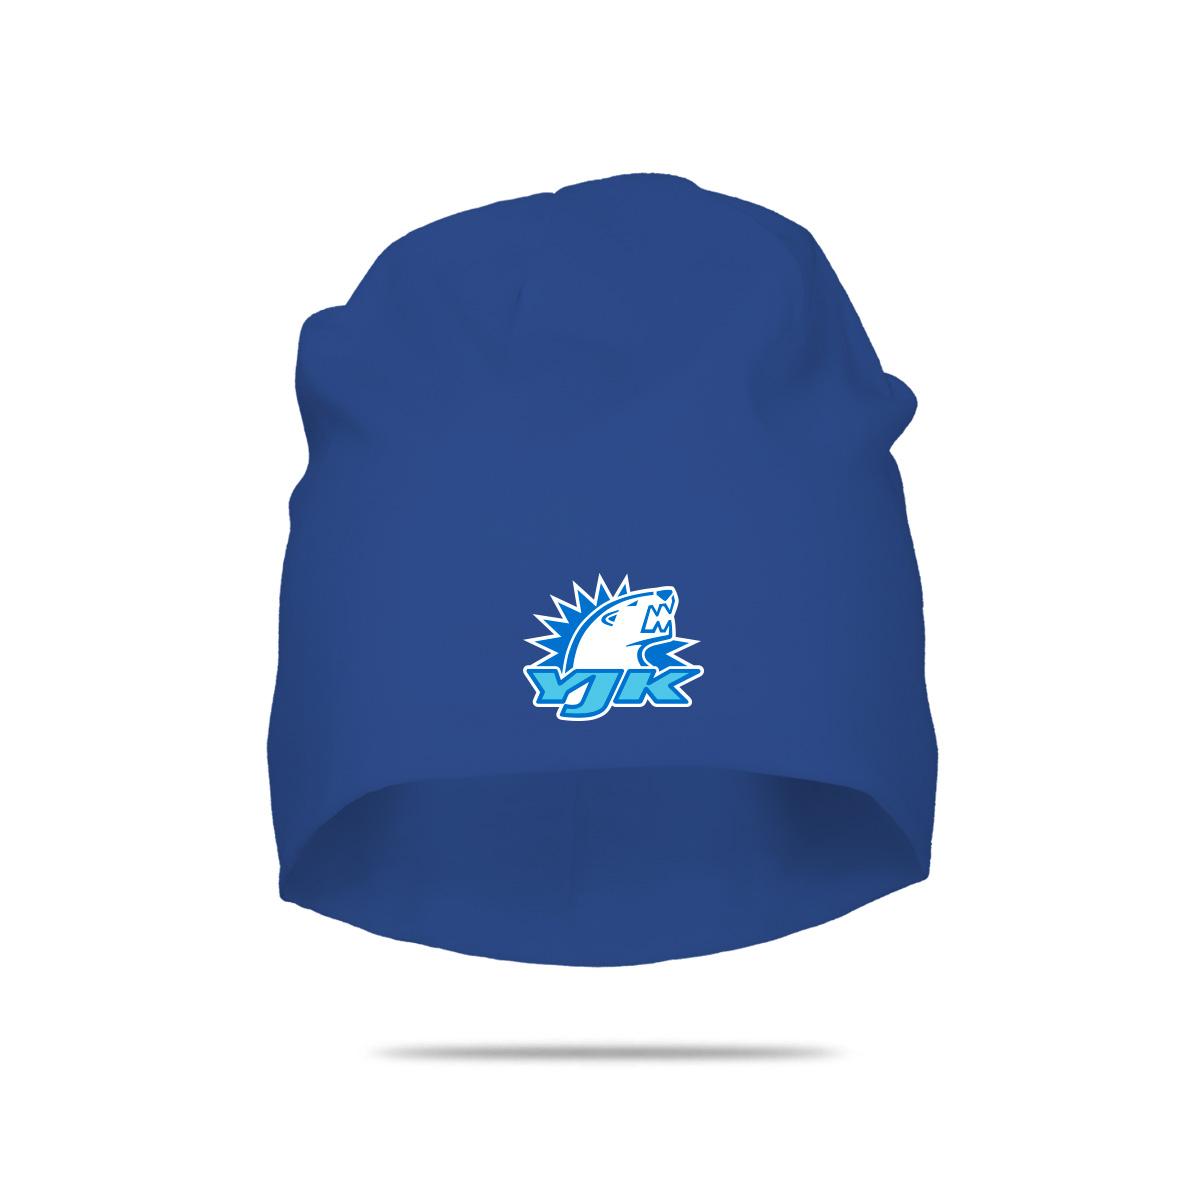 Teamprint-Pujo-YJK-Sininen